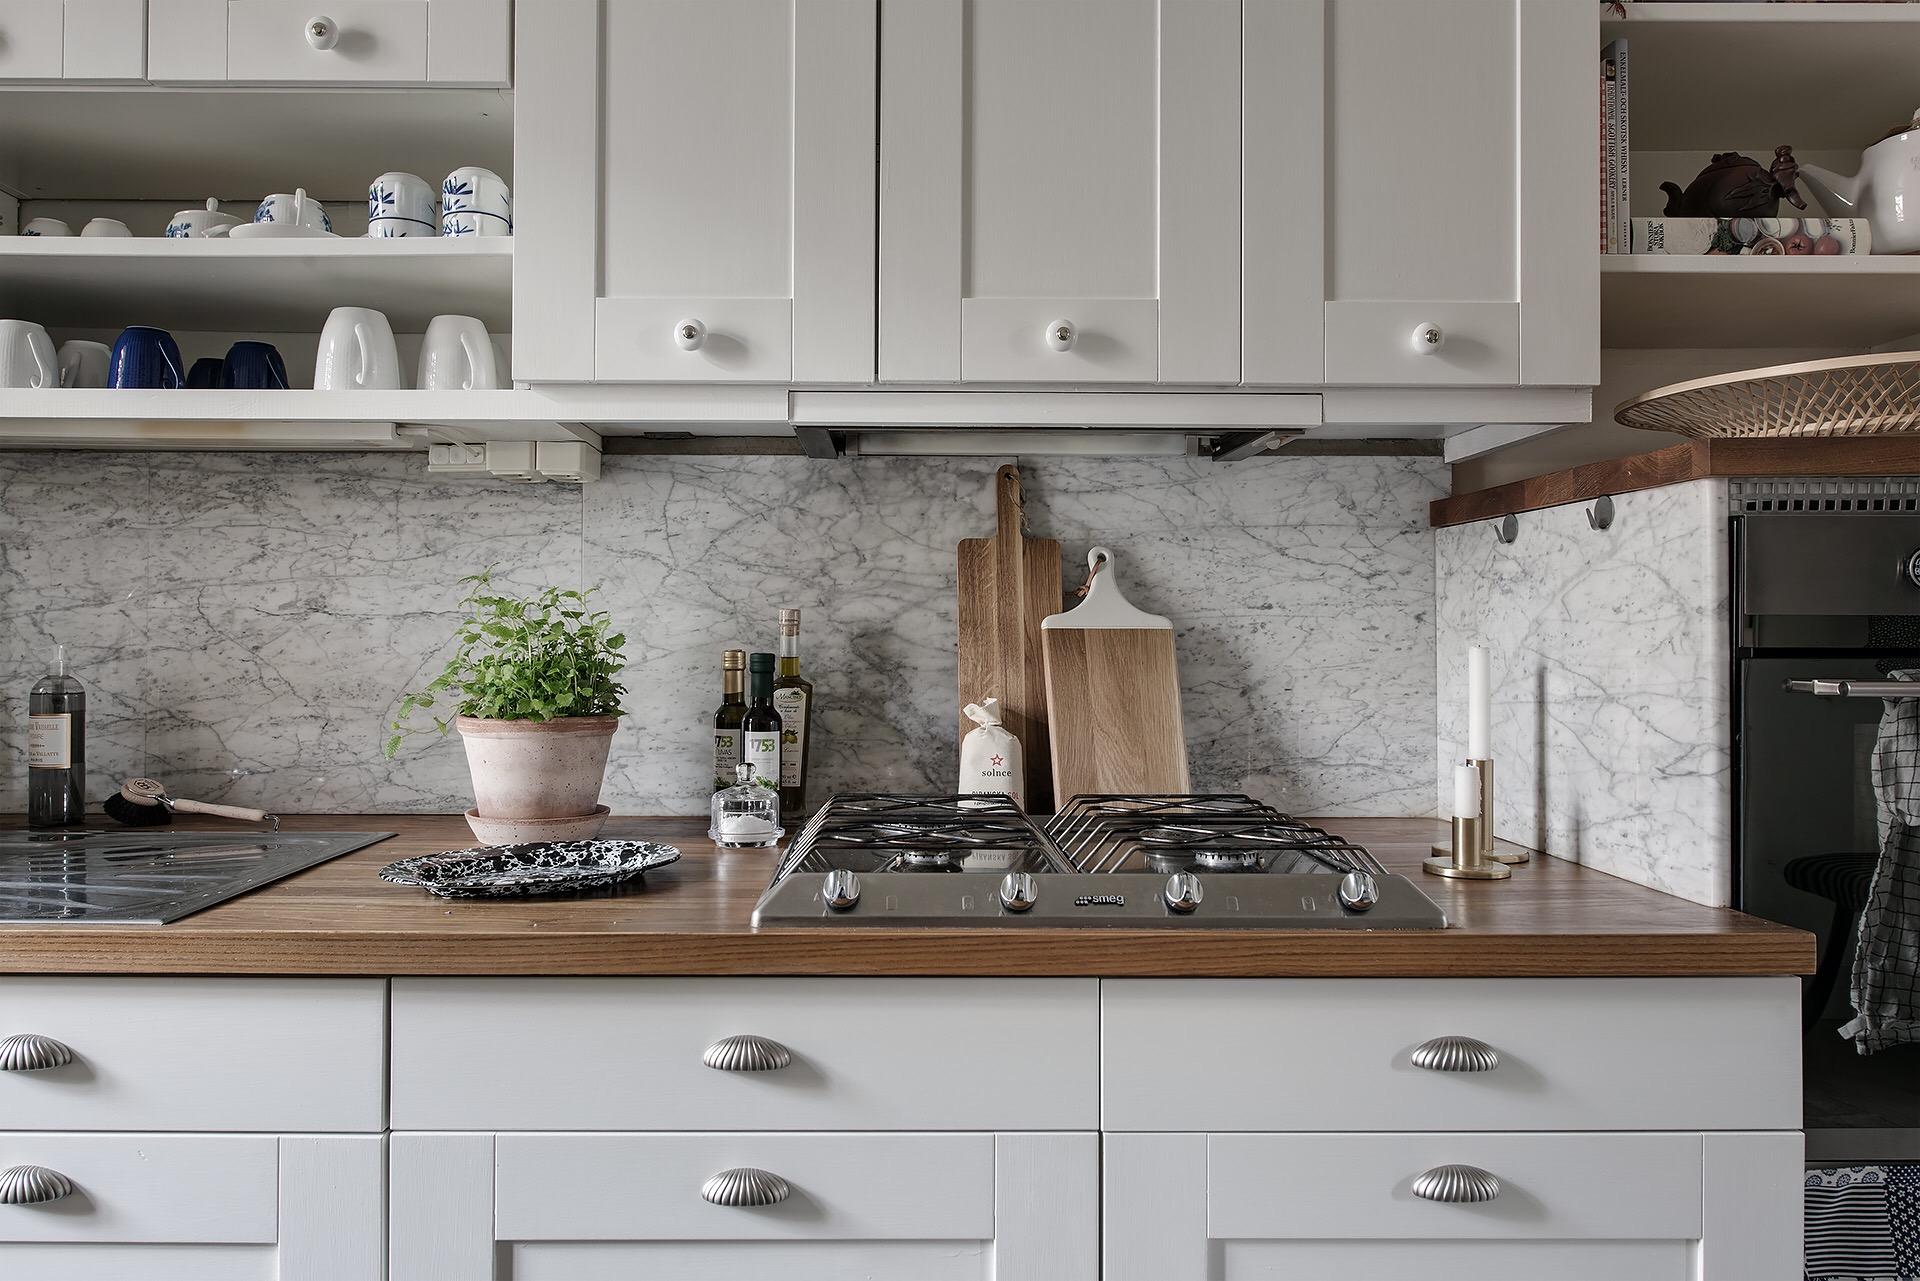 кухня столешница фартук мрамор плита встроенная вытяжка